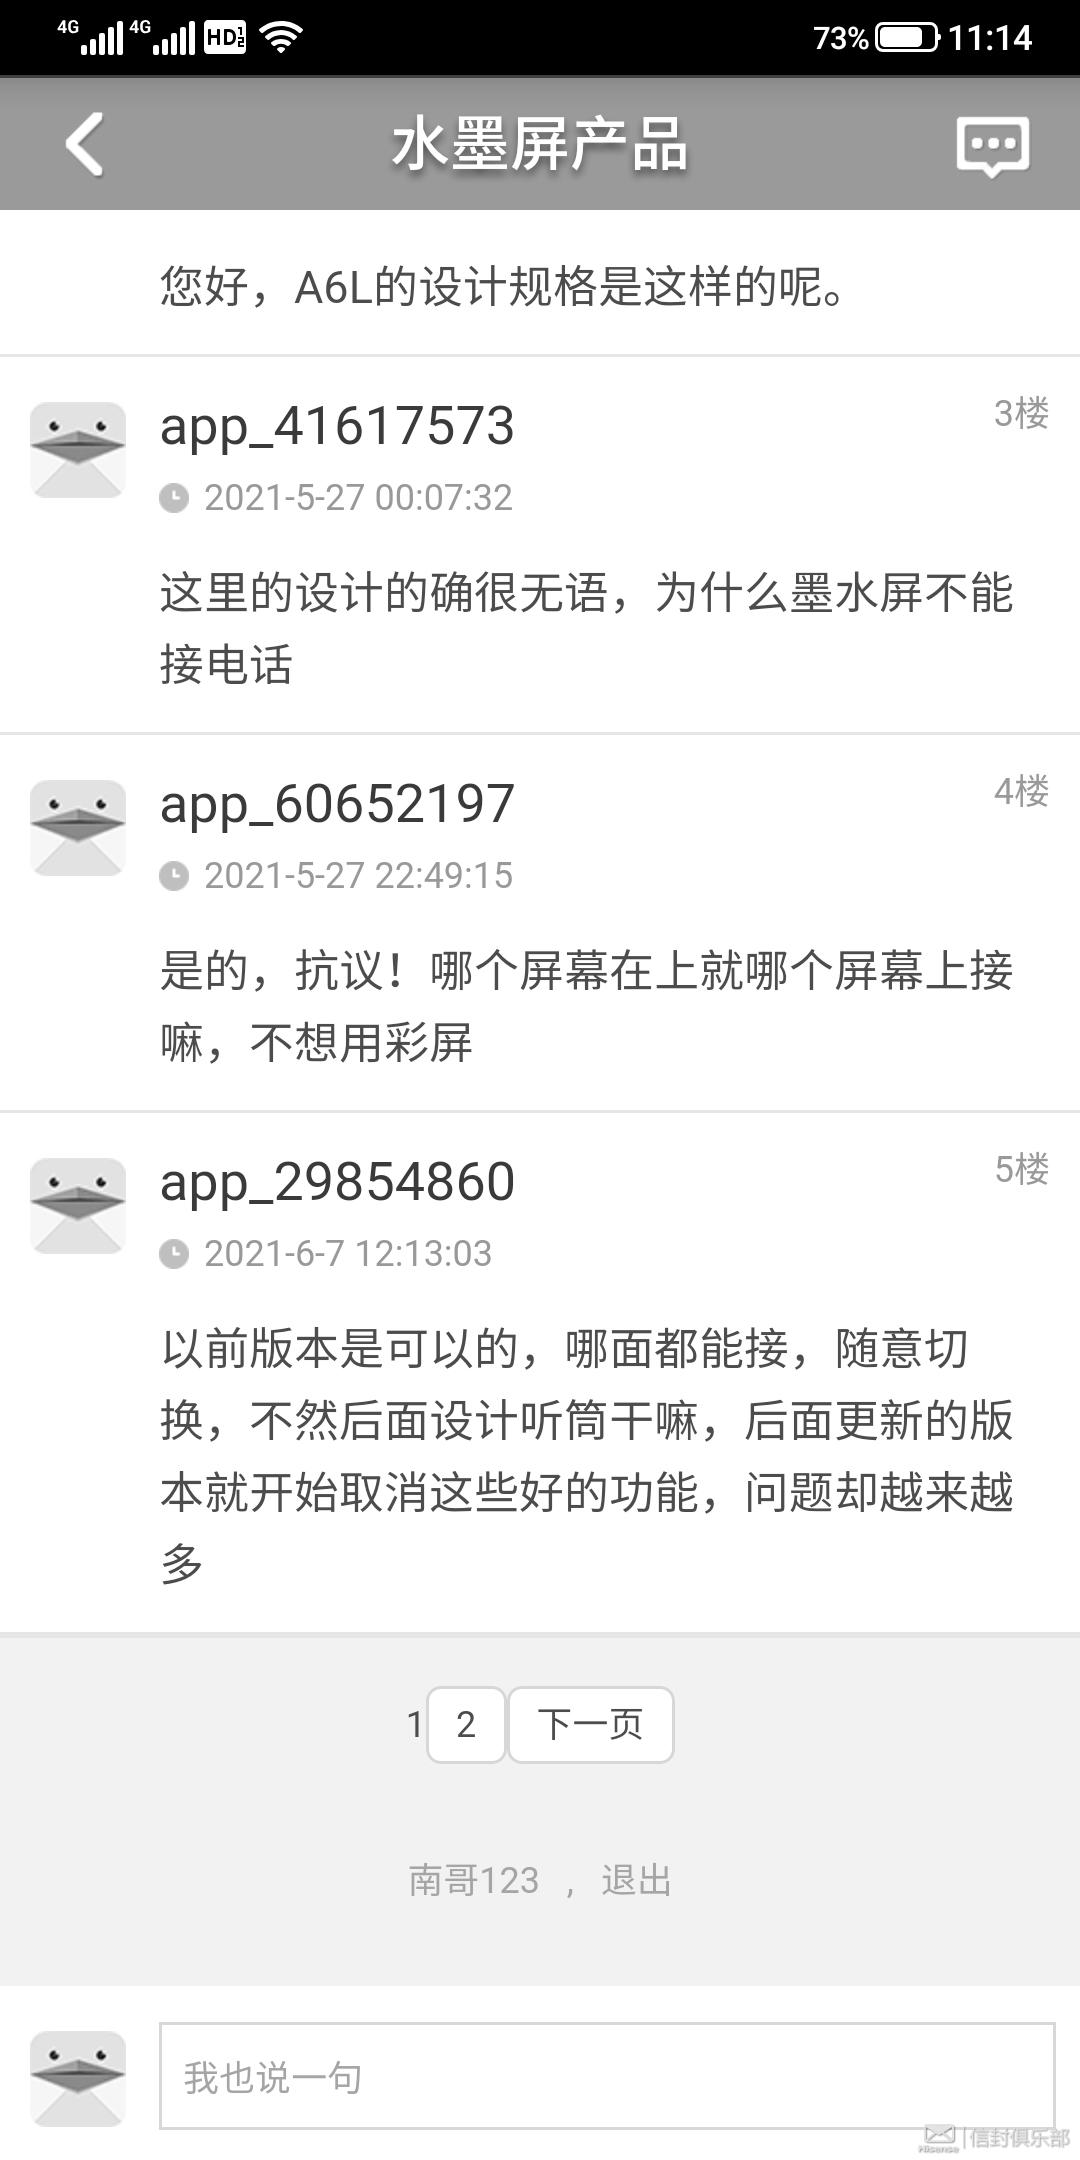 Screenshot_20210623_111421696_信封俱乐部.jpg